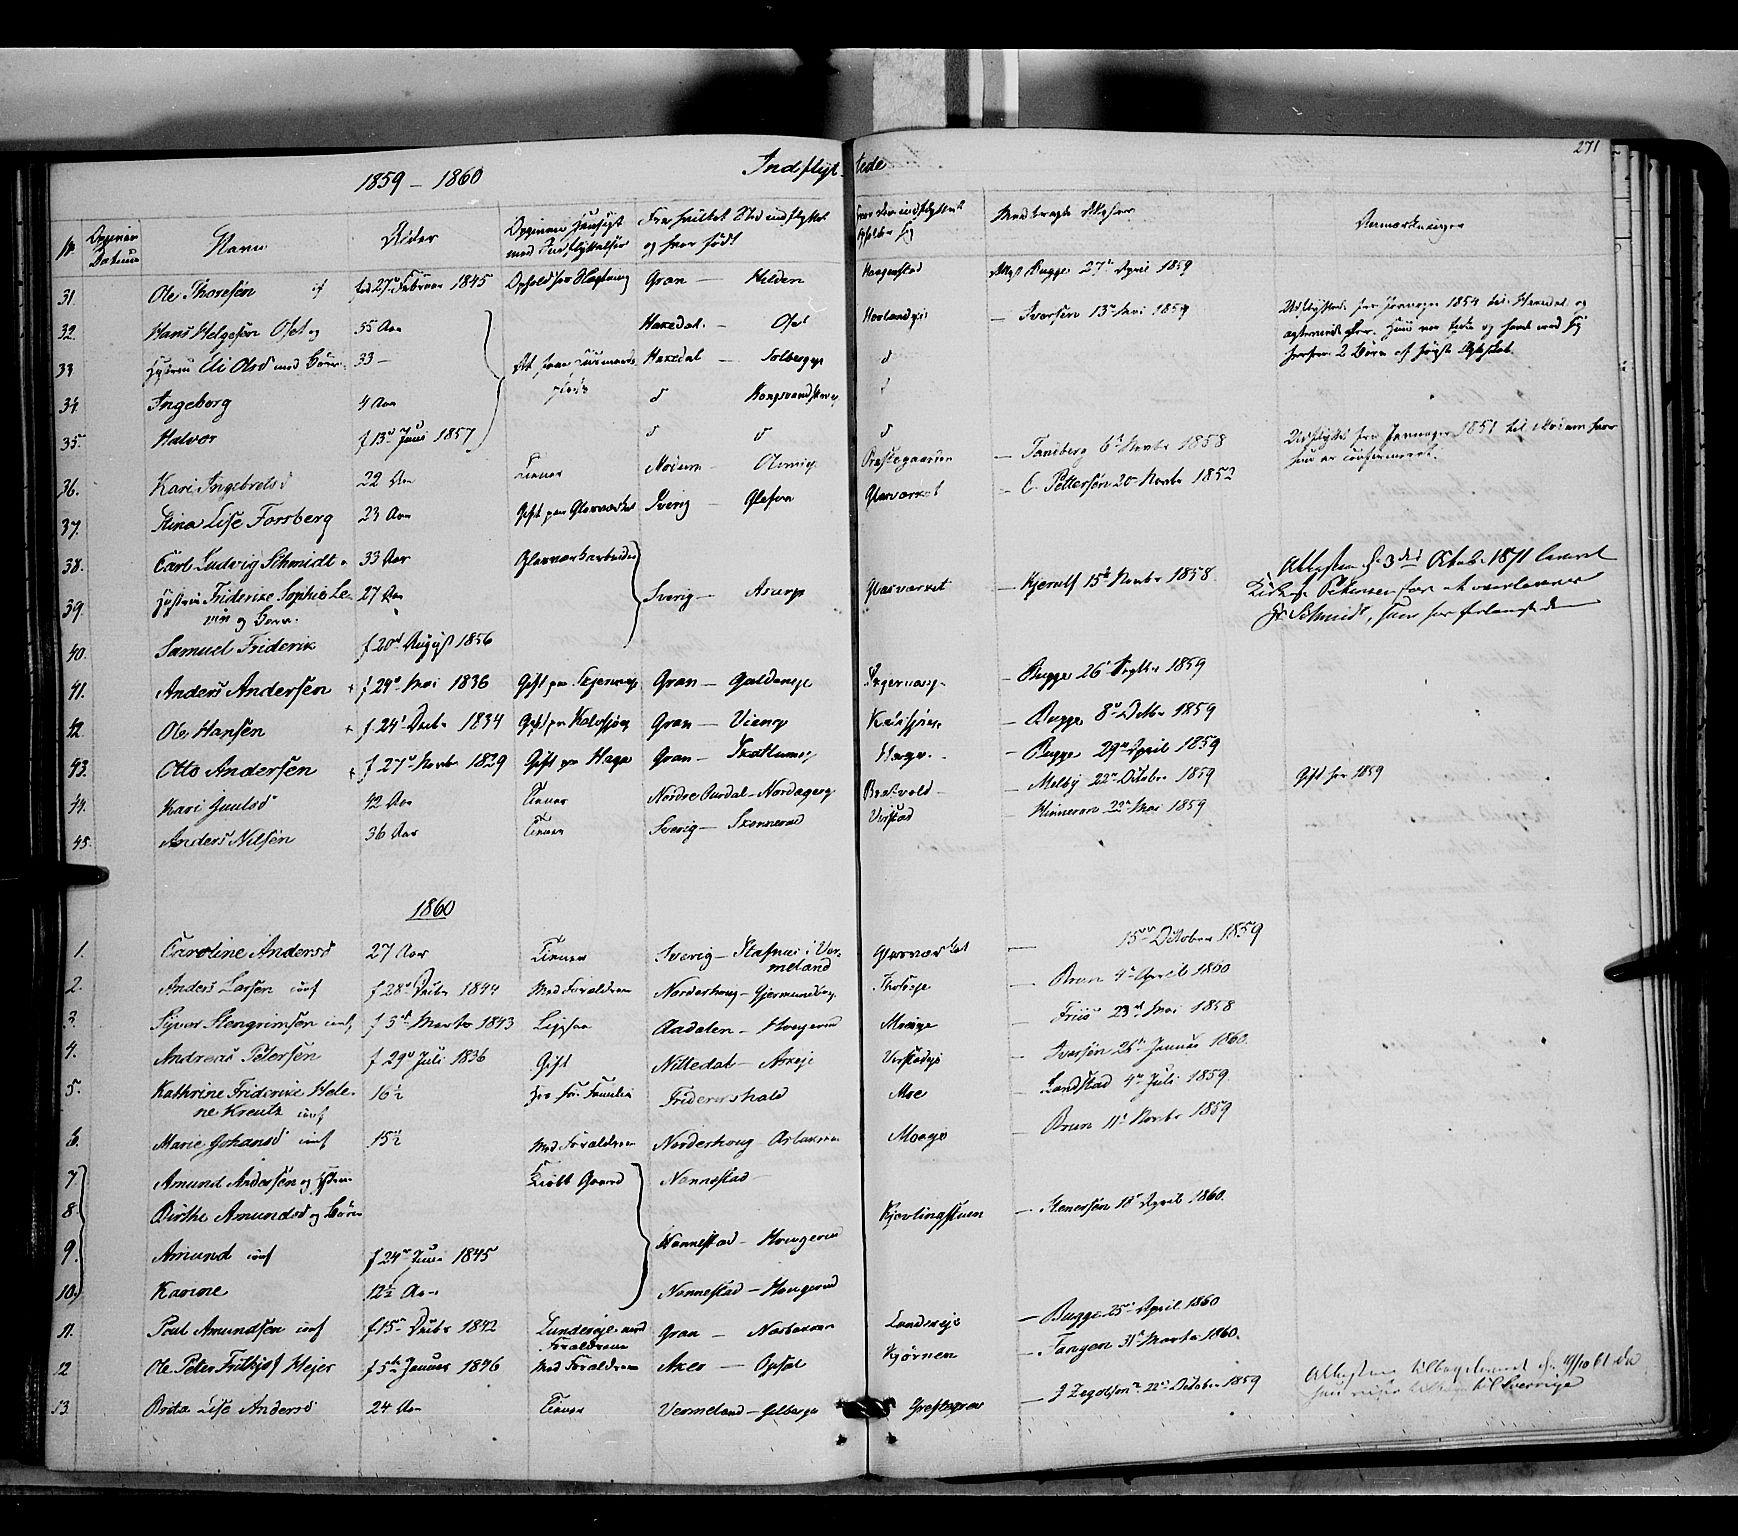 SAH, Jevnaker prestekontor, Ministerialbok nr. 7, 1858-1876, s. 271